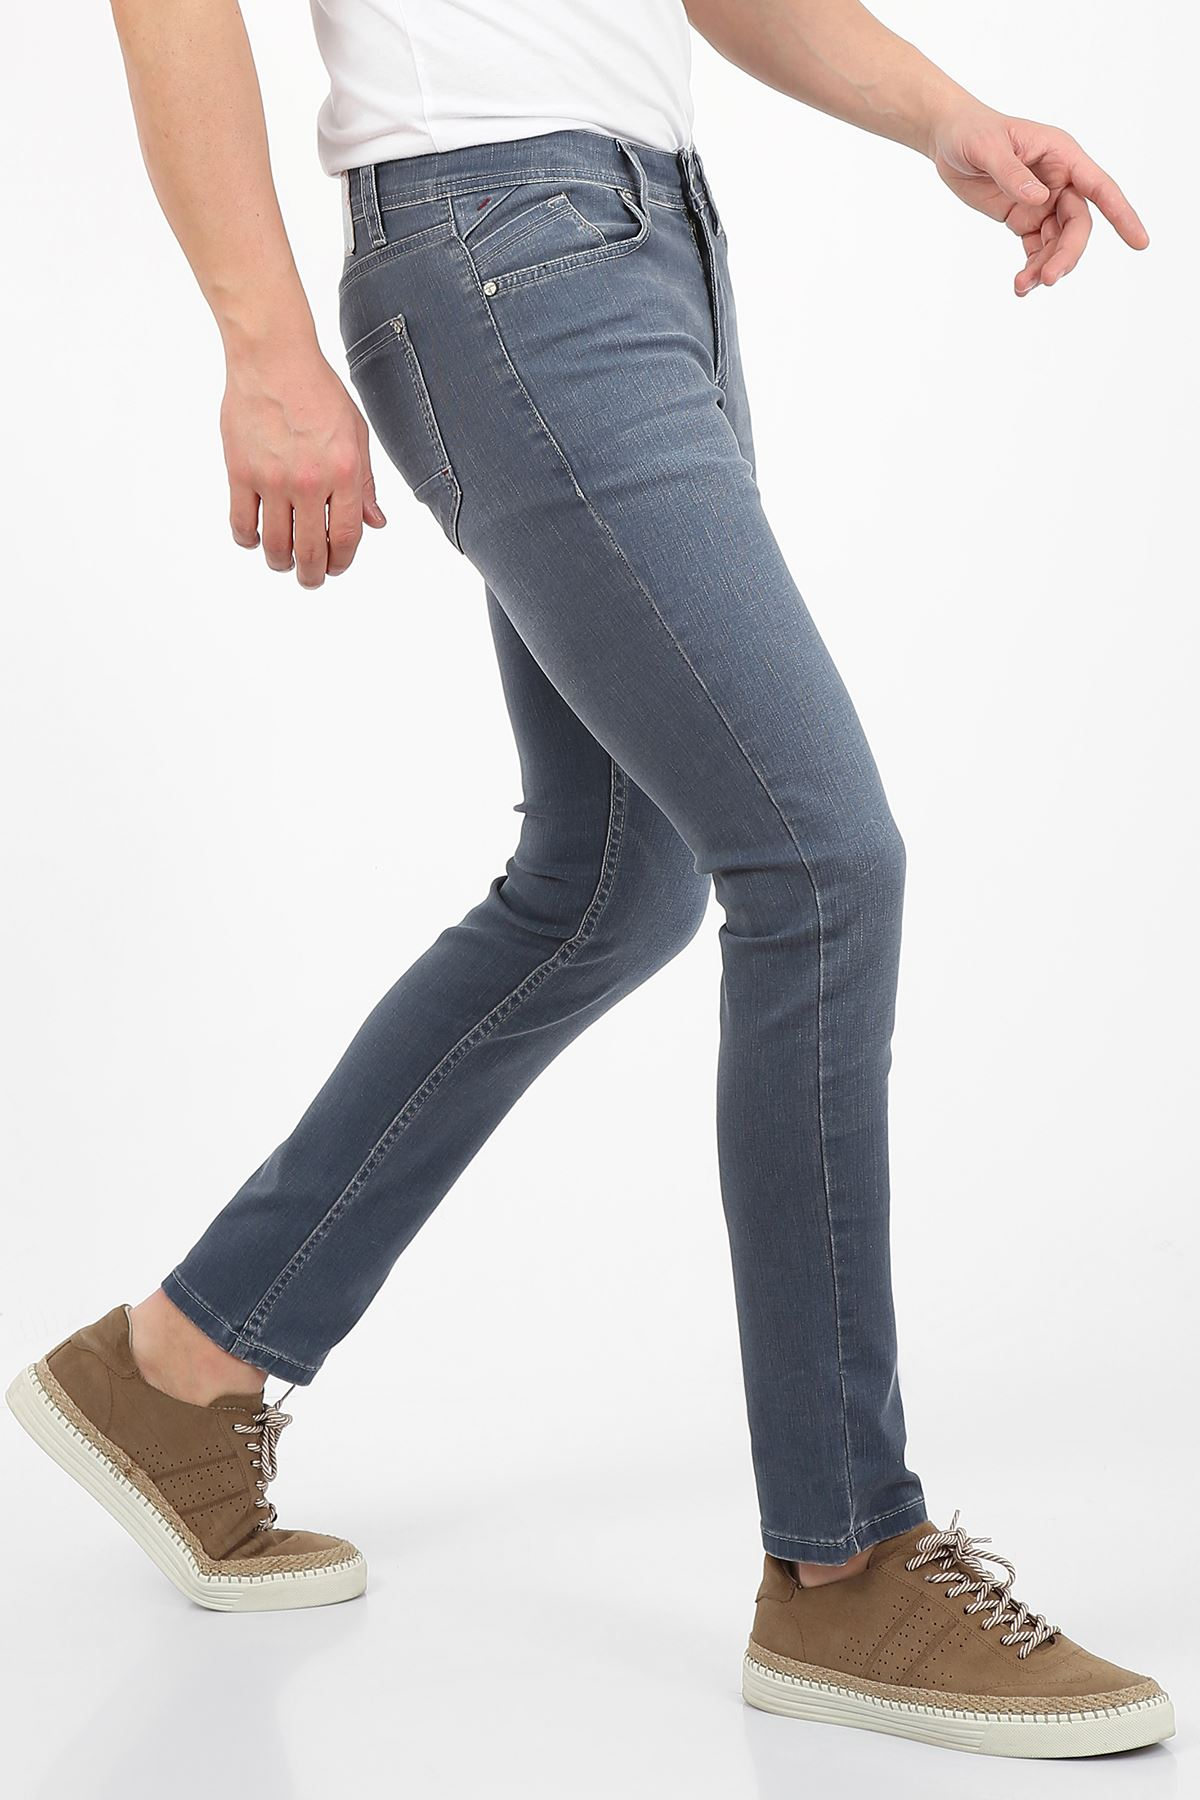 Mavi Slim Fit Fermuarlı Erkek Jeans Pantolon-JONAS